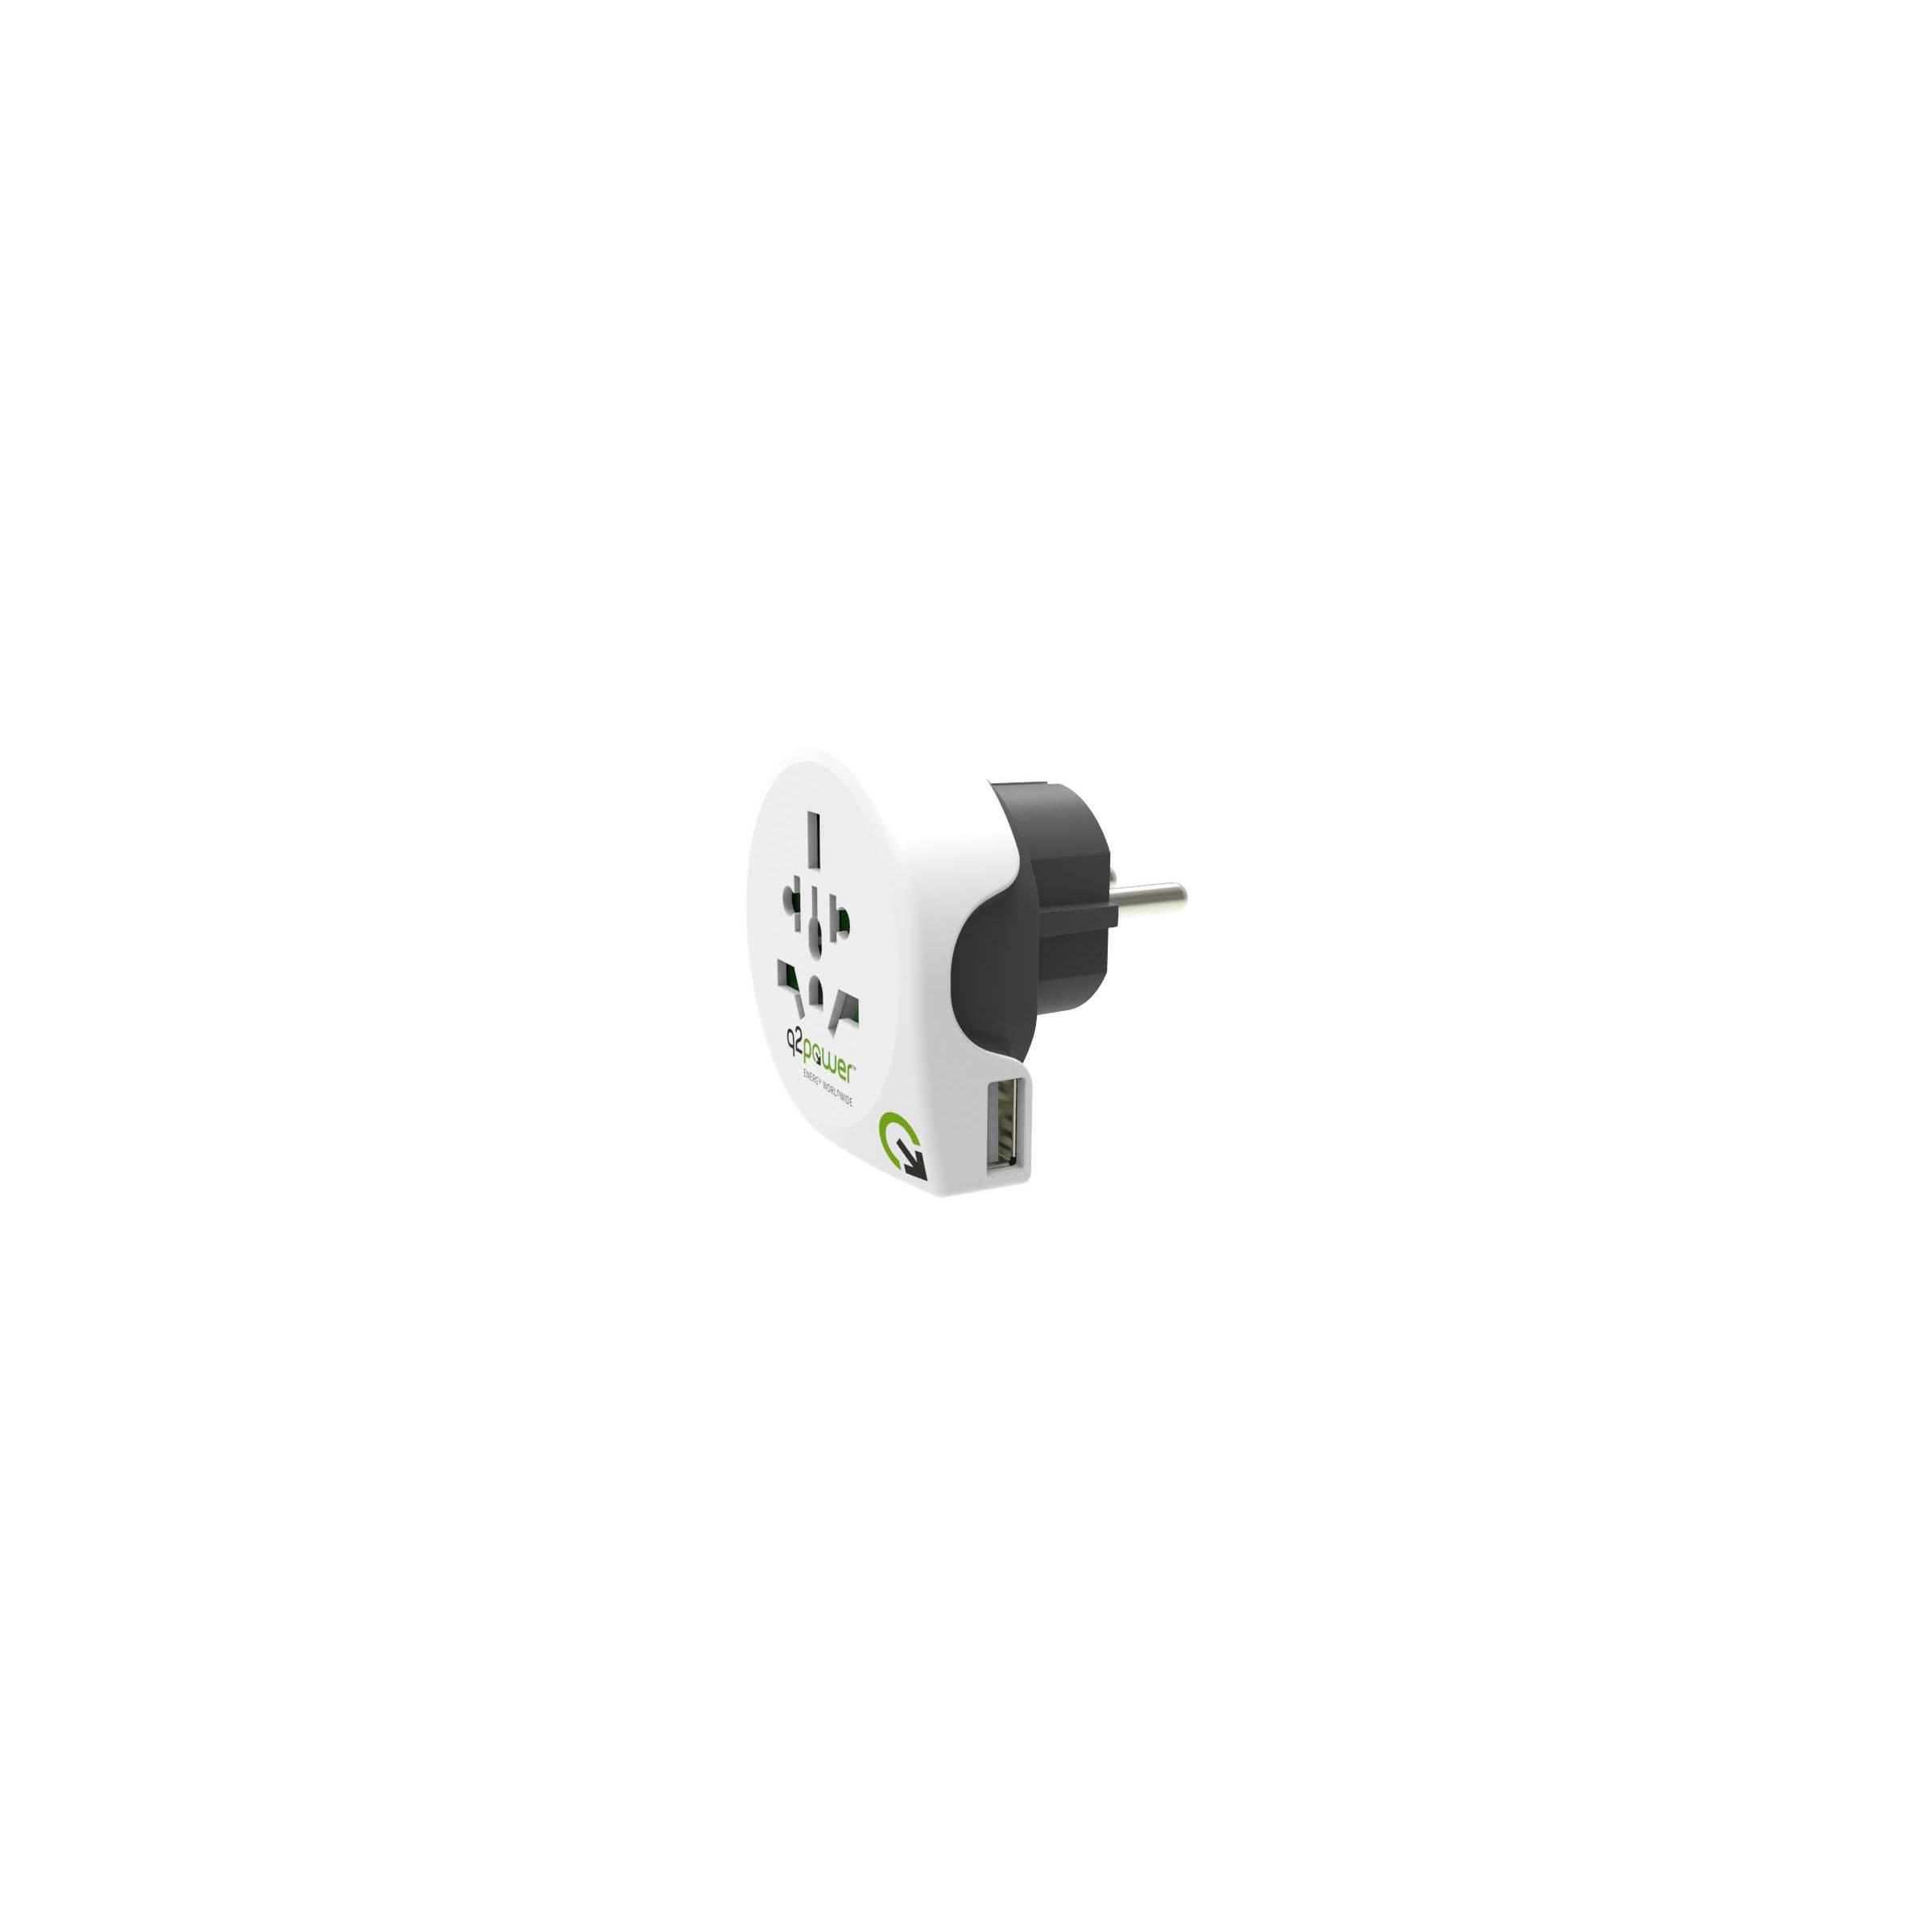 q2power – Q2power ultimative rejseadapter verden til usa/uk/eu/aus m. usb stik version europæisk stik fra mackabler.dk